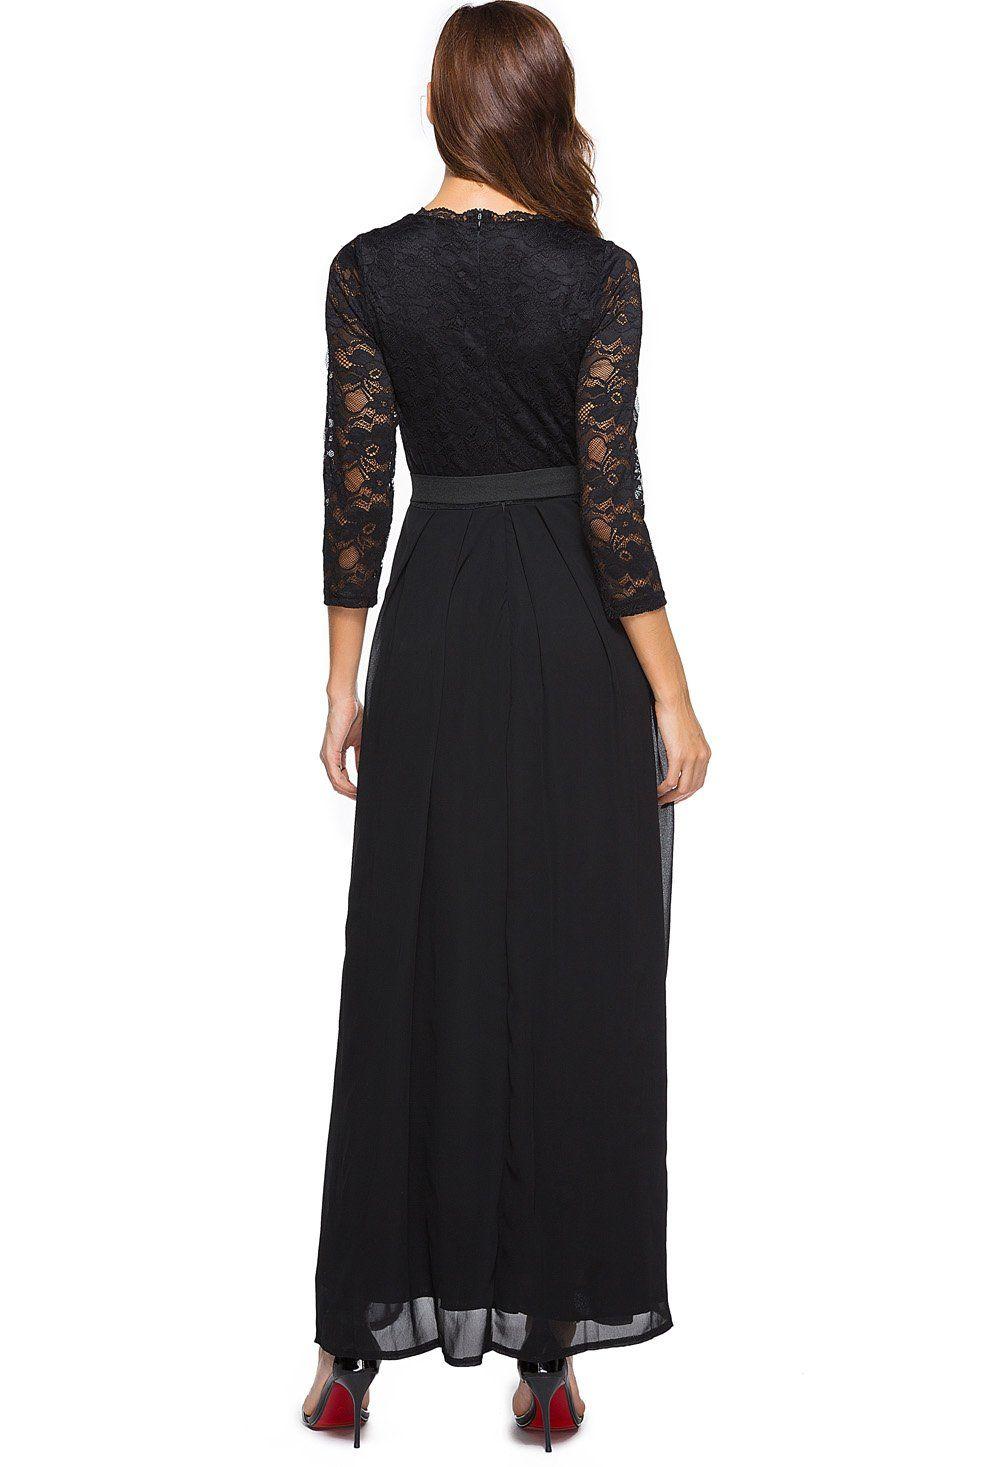 Berydress womens aline vneck sleeve floorlength chiffon lace